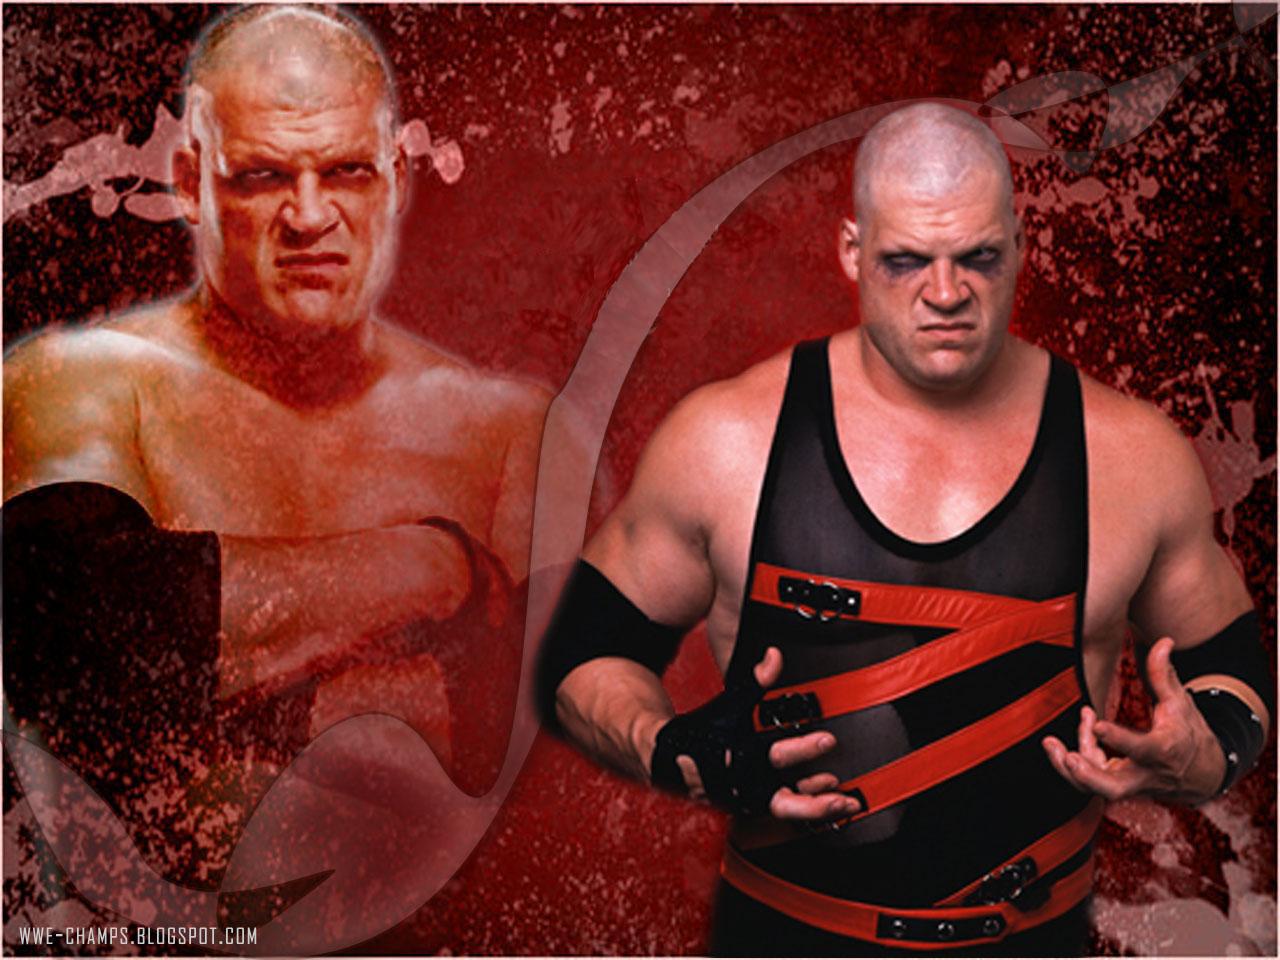 WWE CHAMPS: 'THE BIG RED MACHINE' KANE  WWE CHAMPS: ...